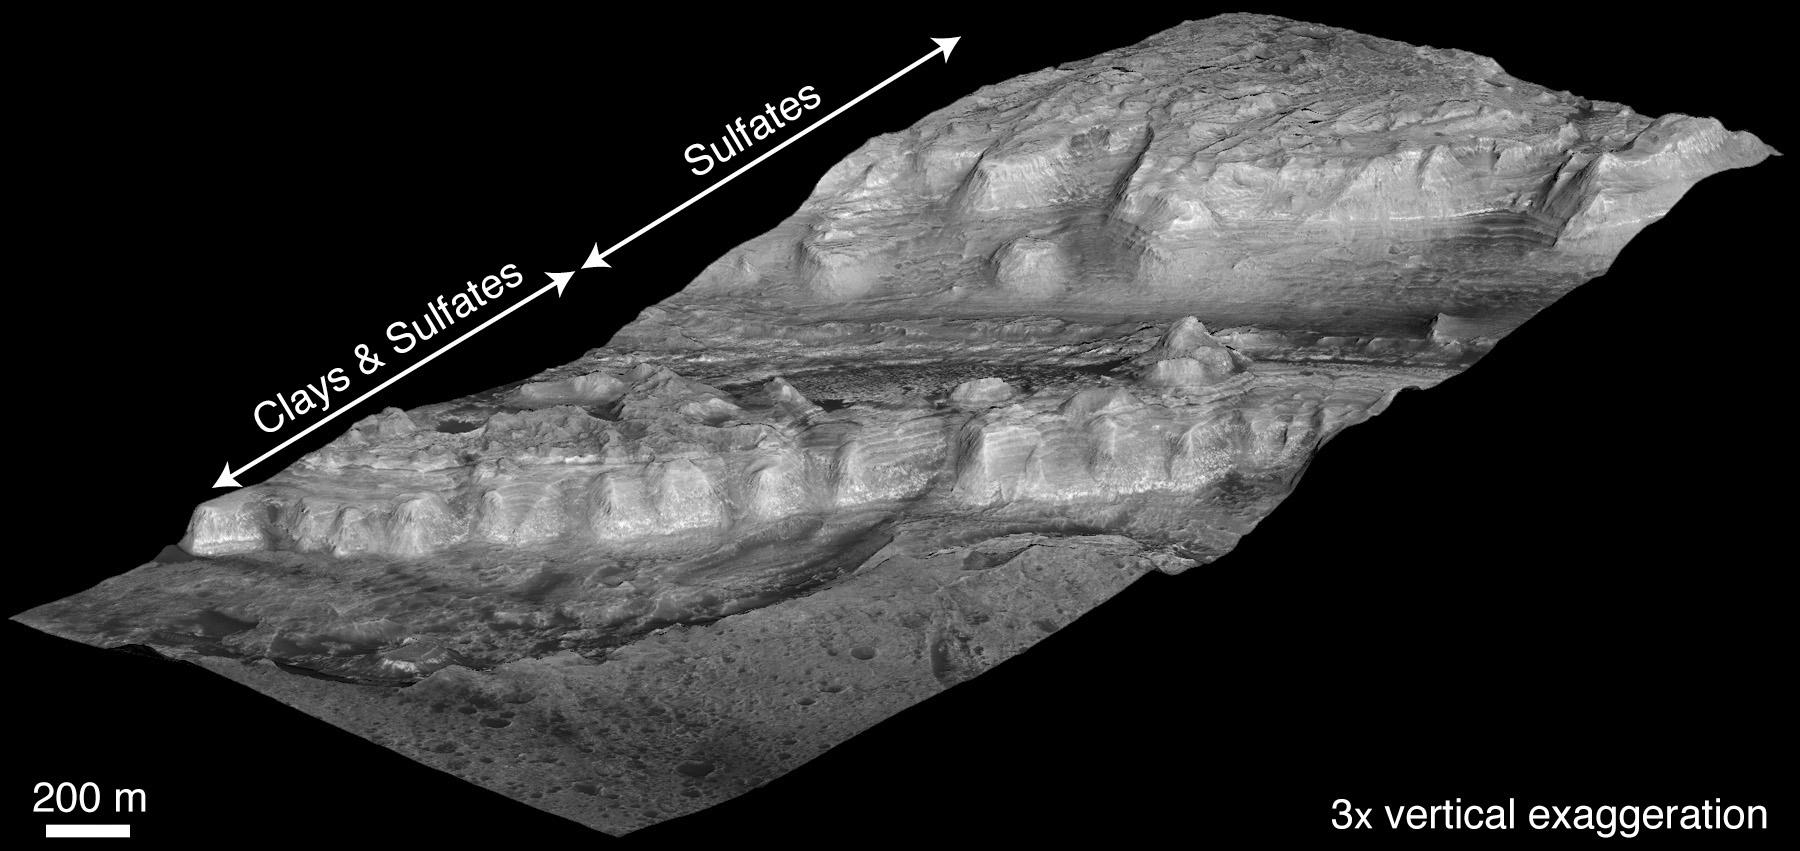 NEWS - Mars Reconnaissance Orbiter